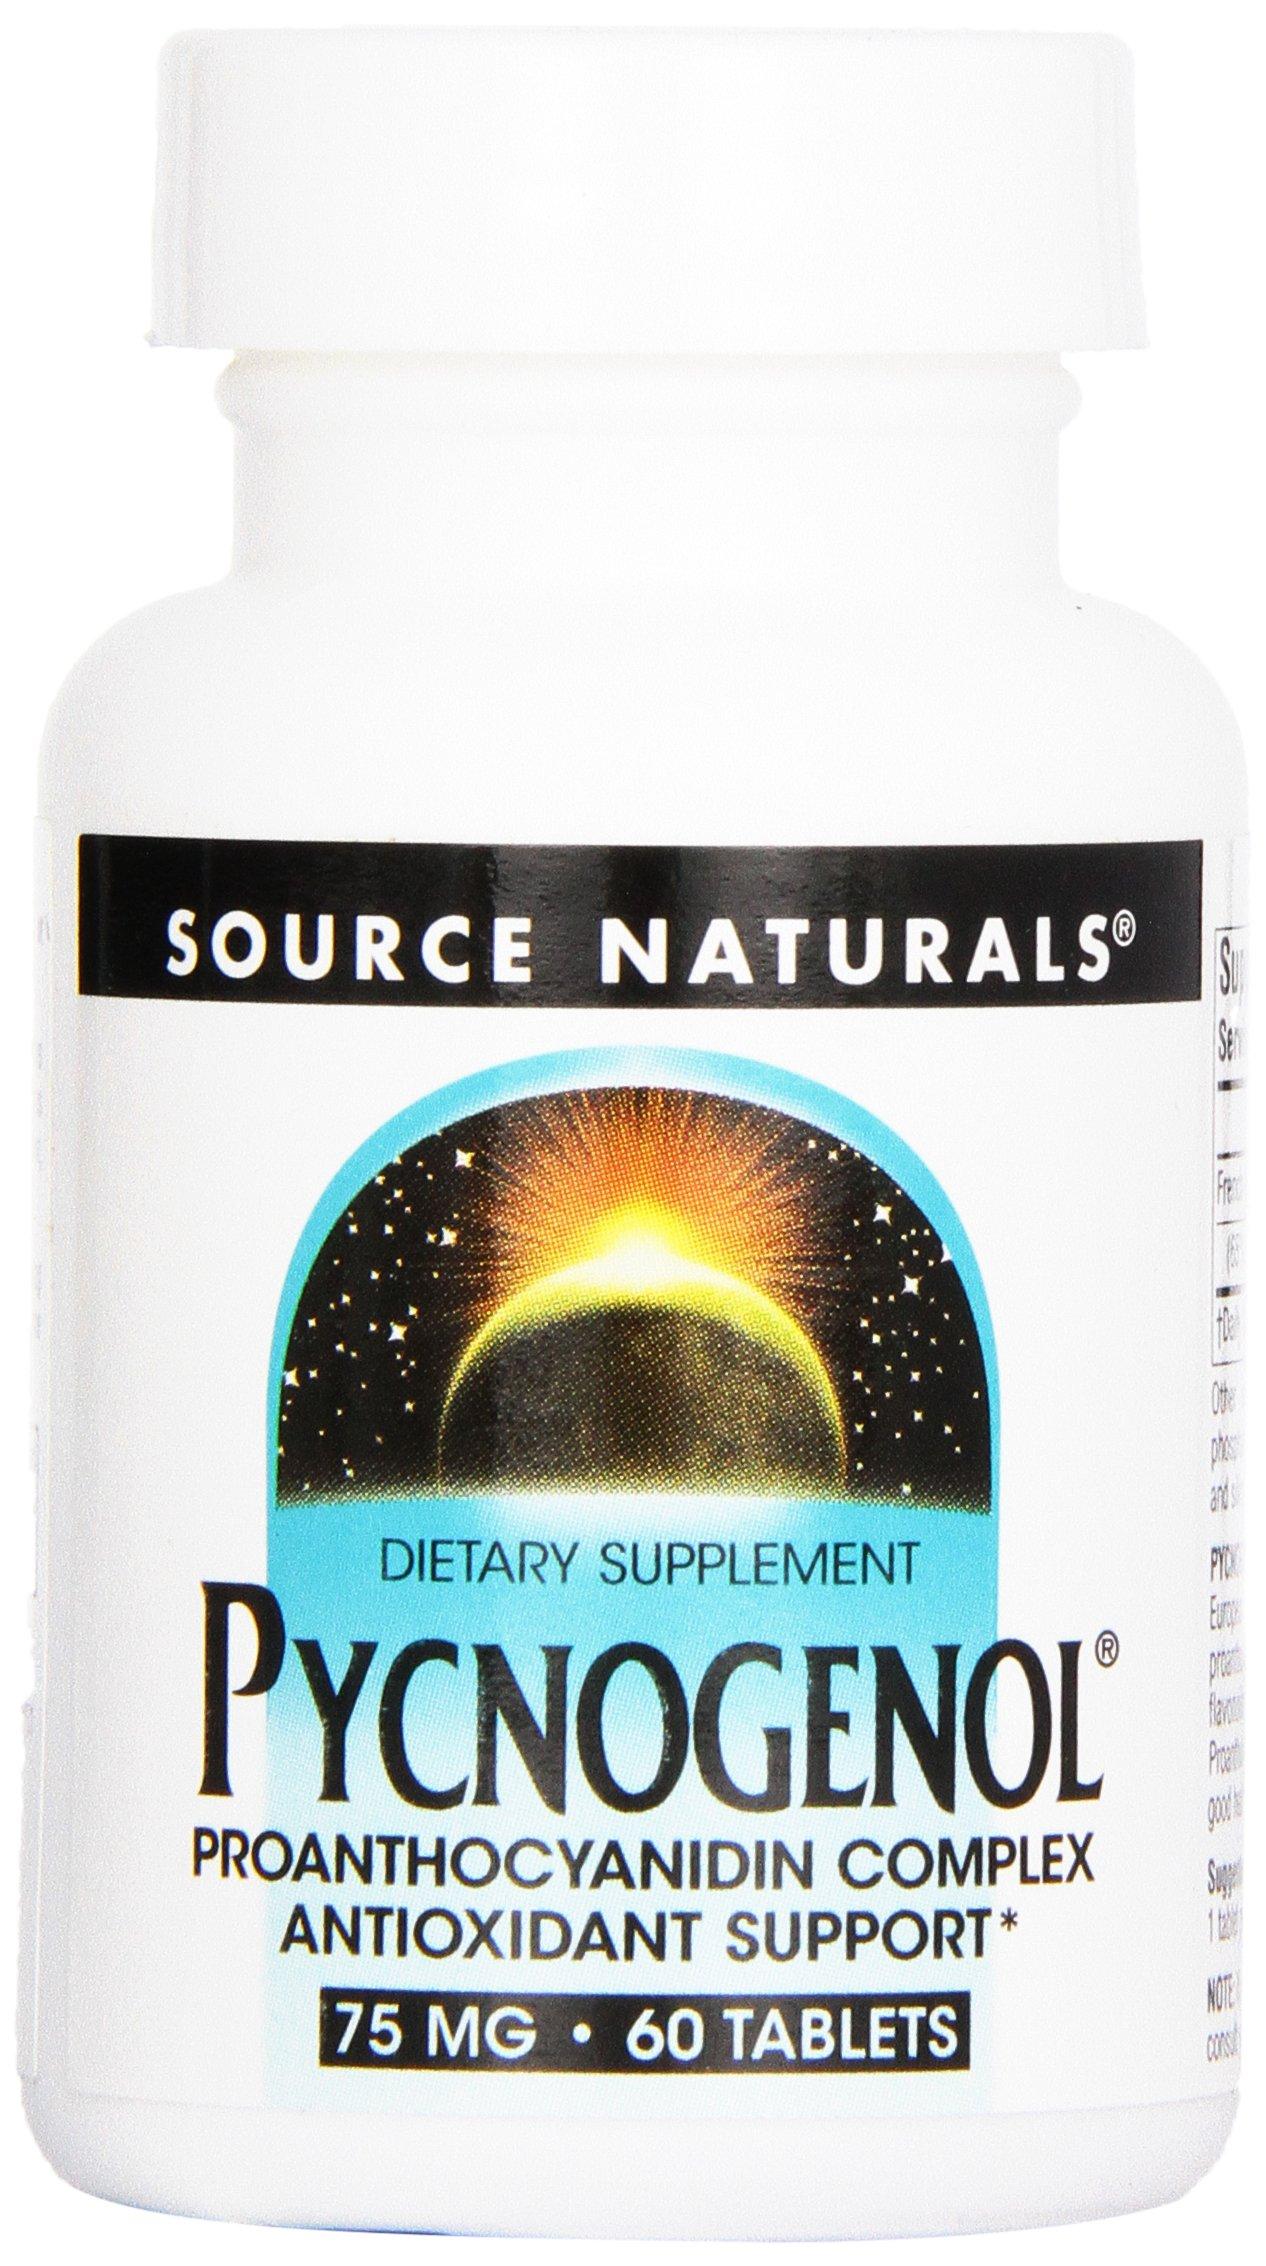 Source Naturals Pycnogenol 75mg 60 Tablets (Pack of 12)